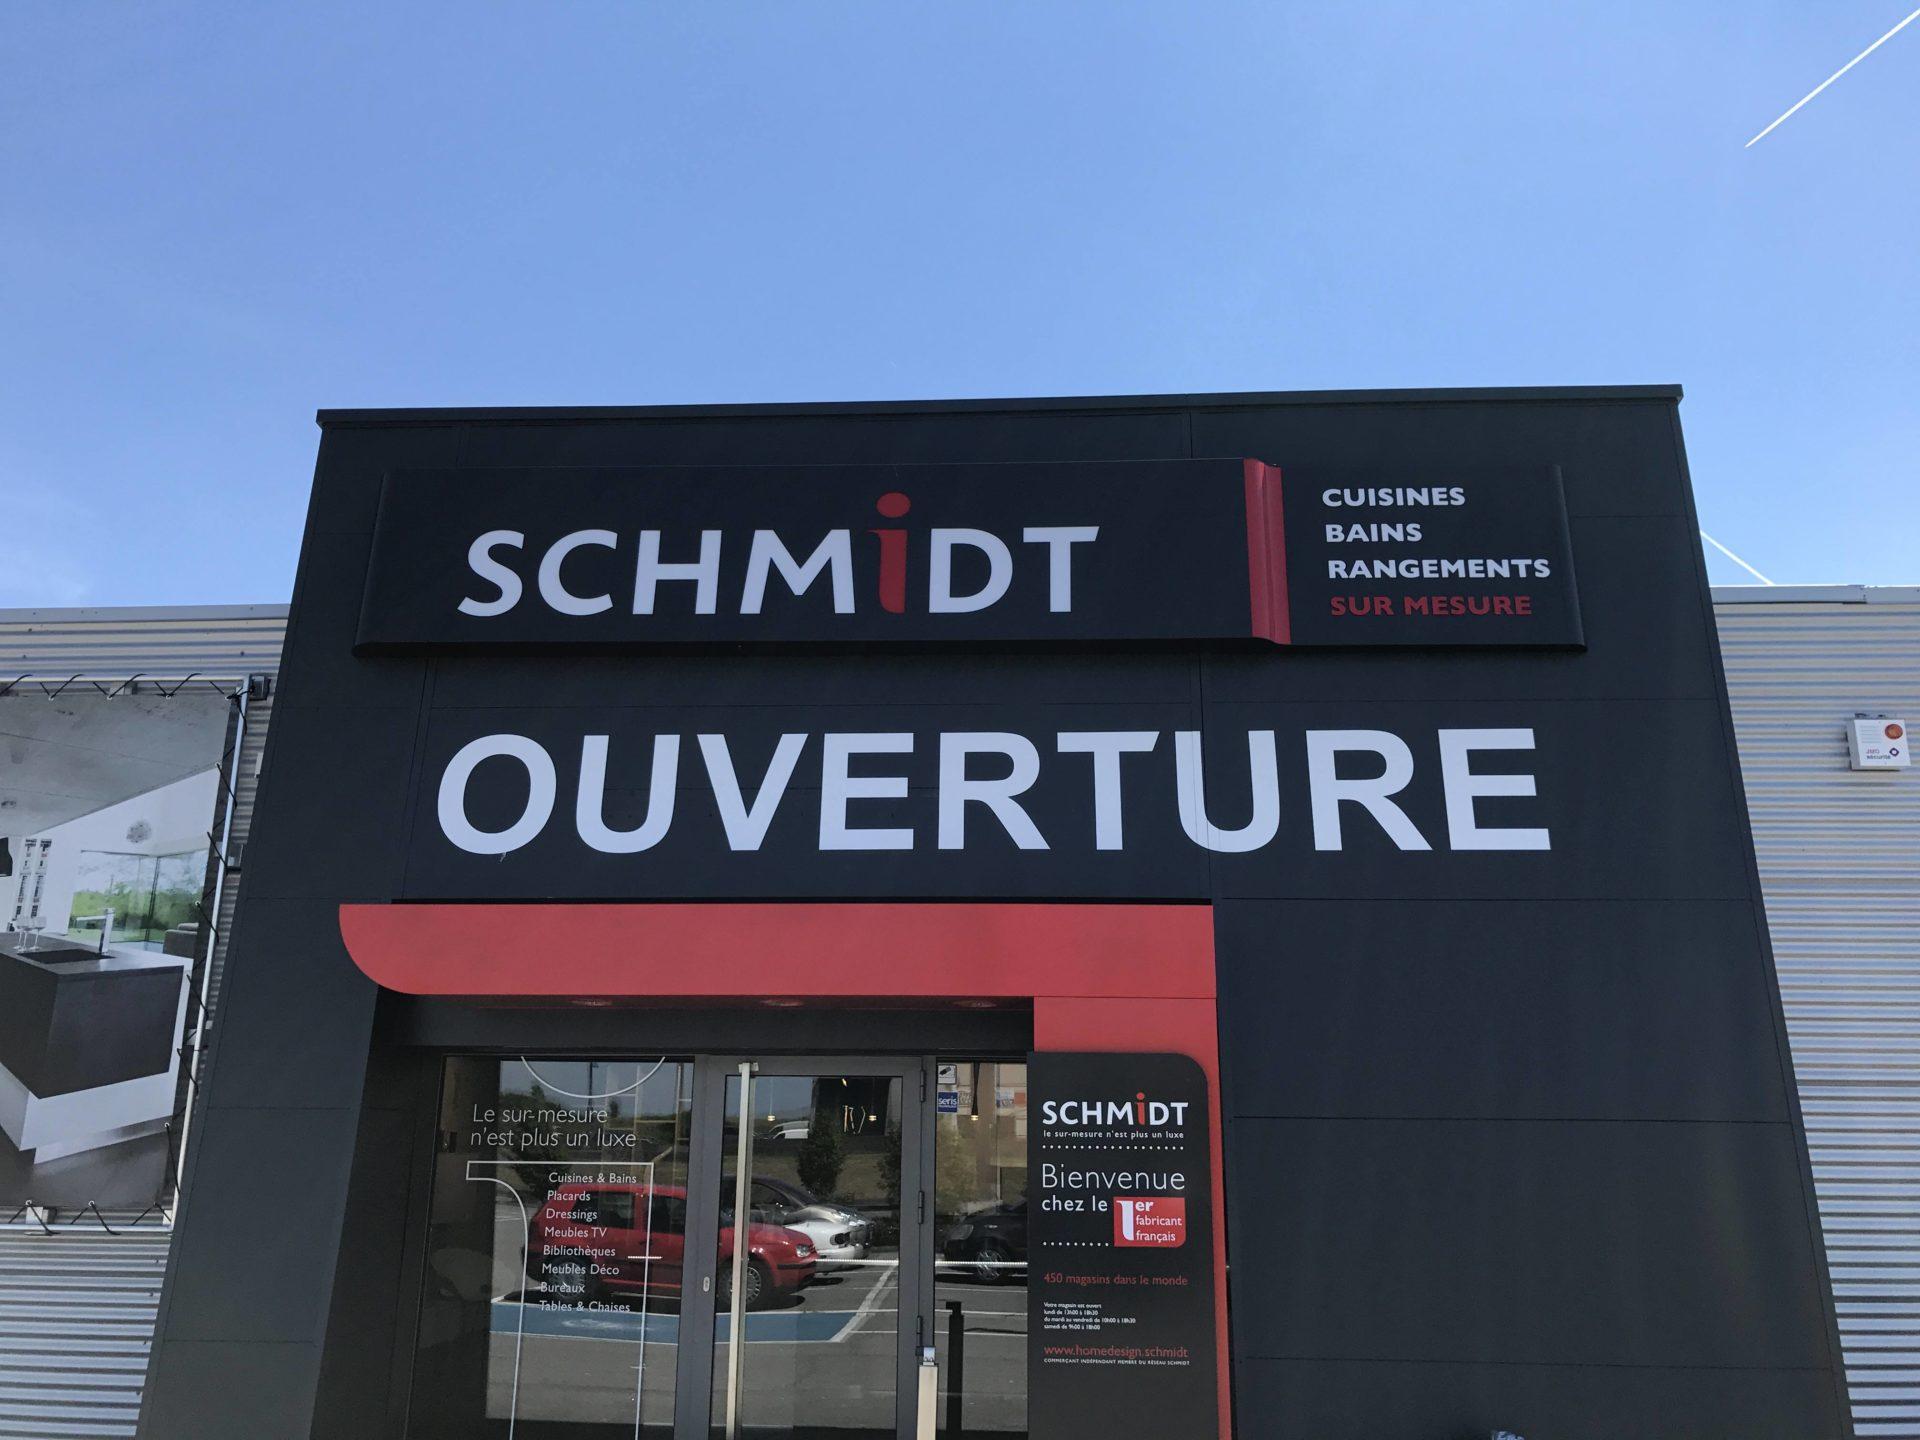 Lettrage - Schmidt